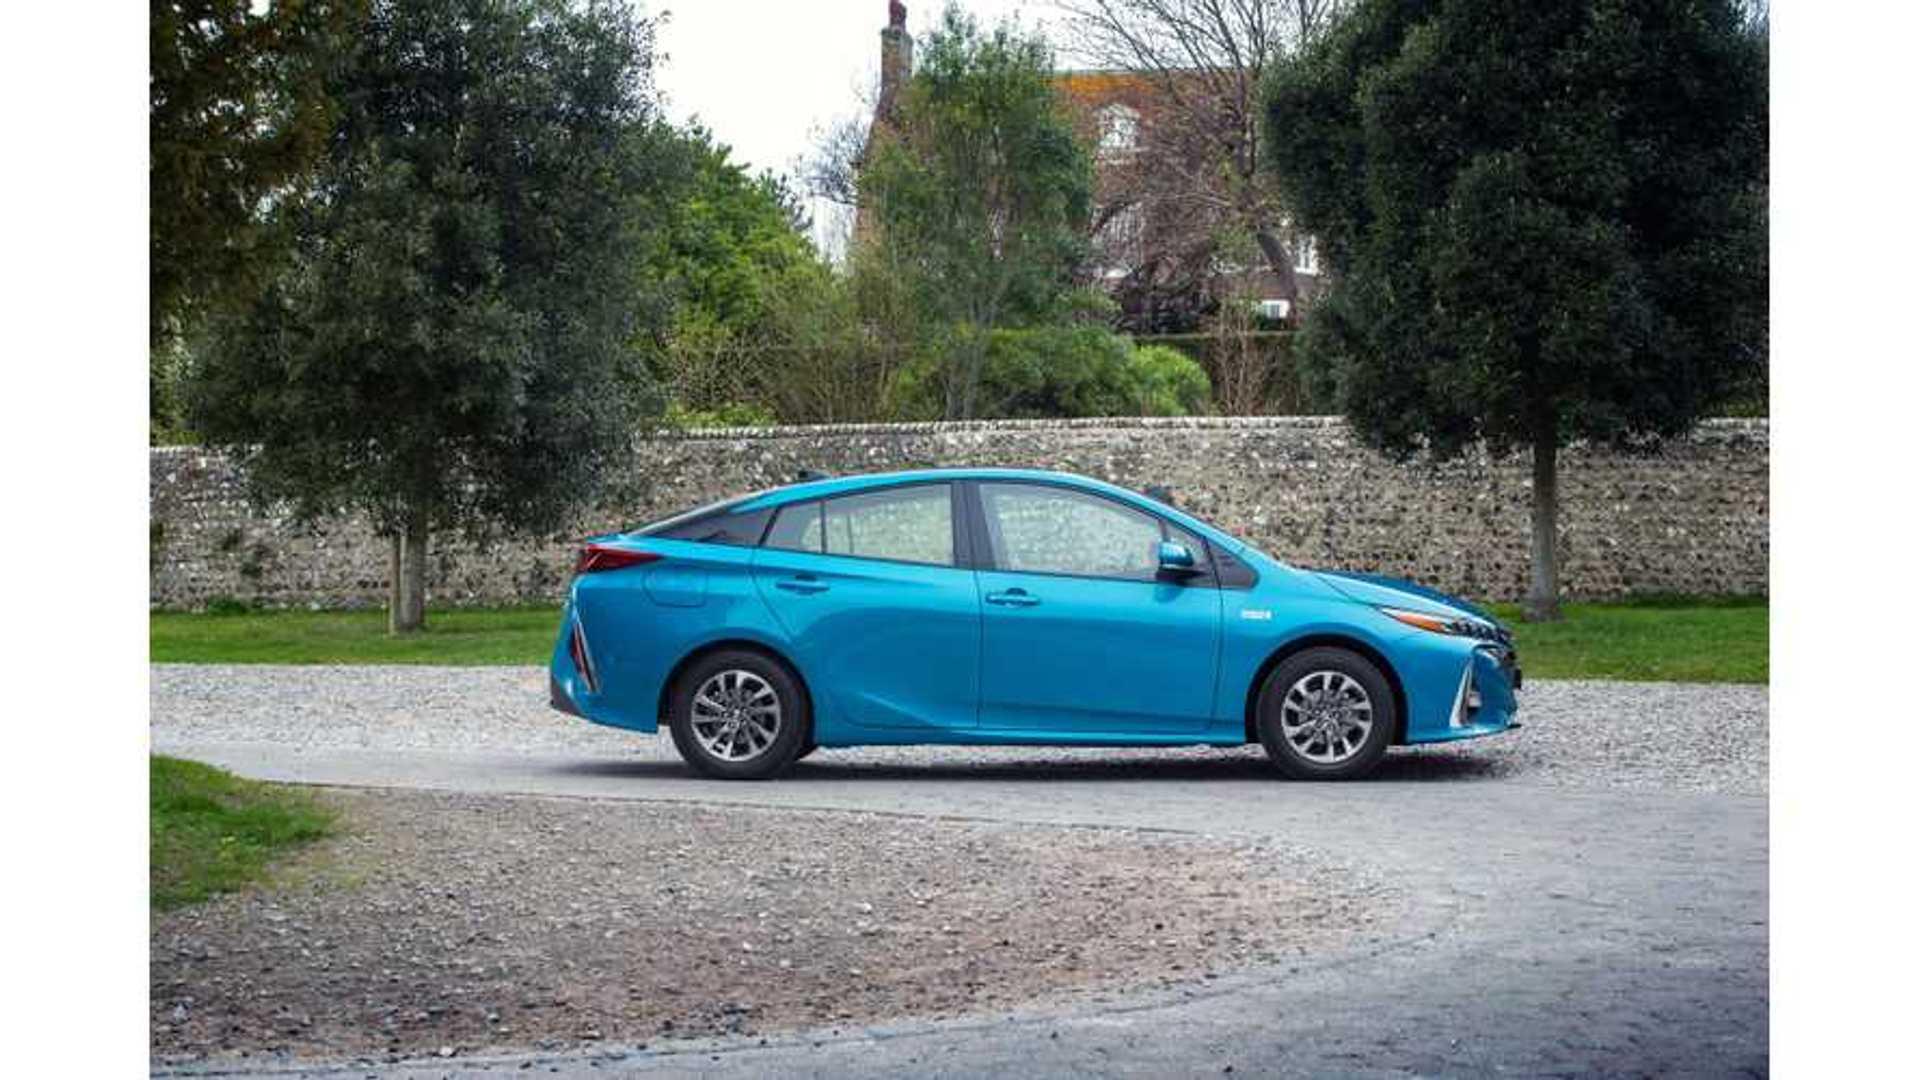 Plug In Hybrid Cars >> Price Range Comparison Of Plug In Hybrid Cars Available In U S